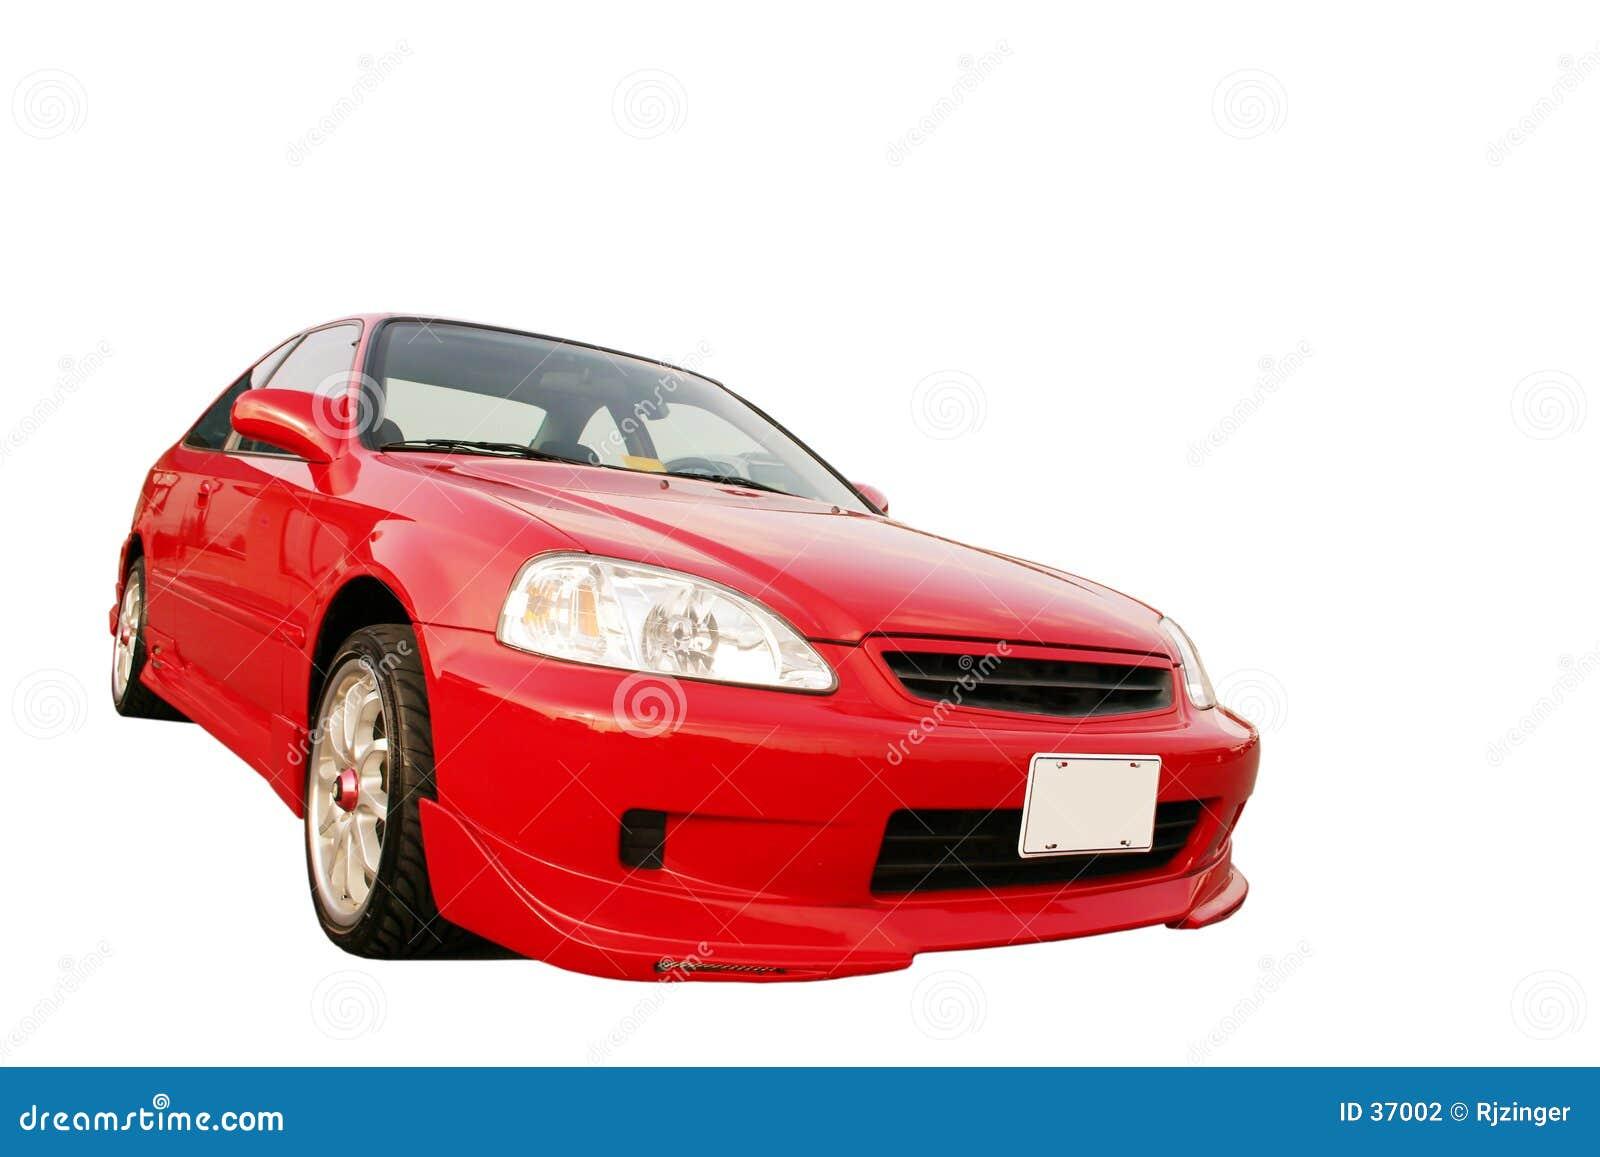 Download Honda Civic EX - rojo 3 foto de archivo. Imagen de piloto - 37002